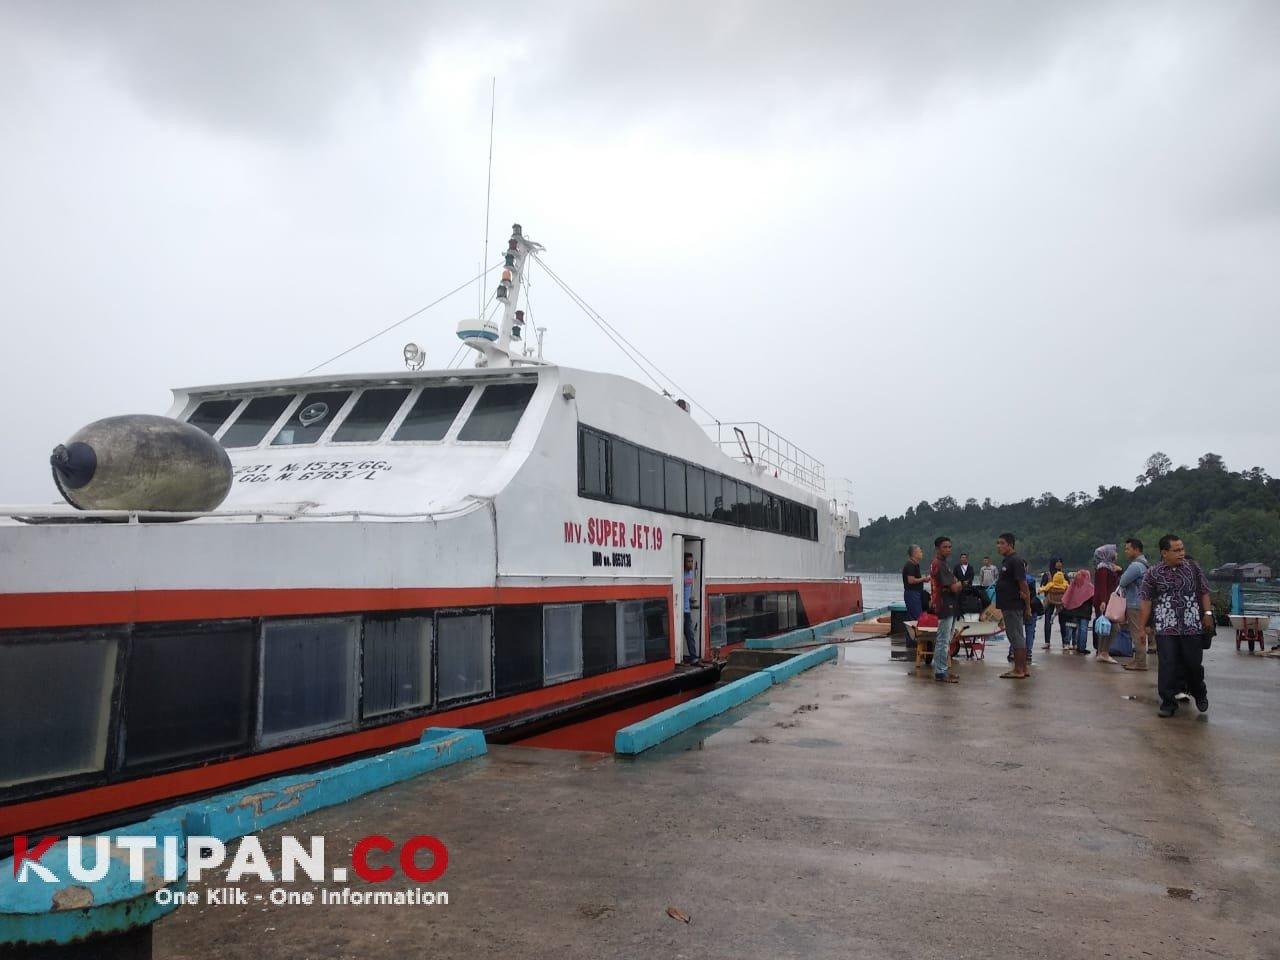 Foto Antisipasi corona, Kutipan lingga, Pemkab Lingga, Strategi, Update Covid-19